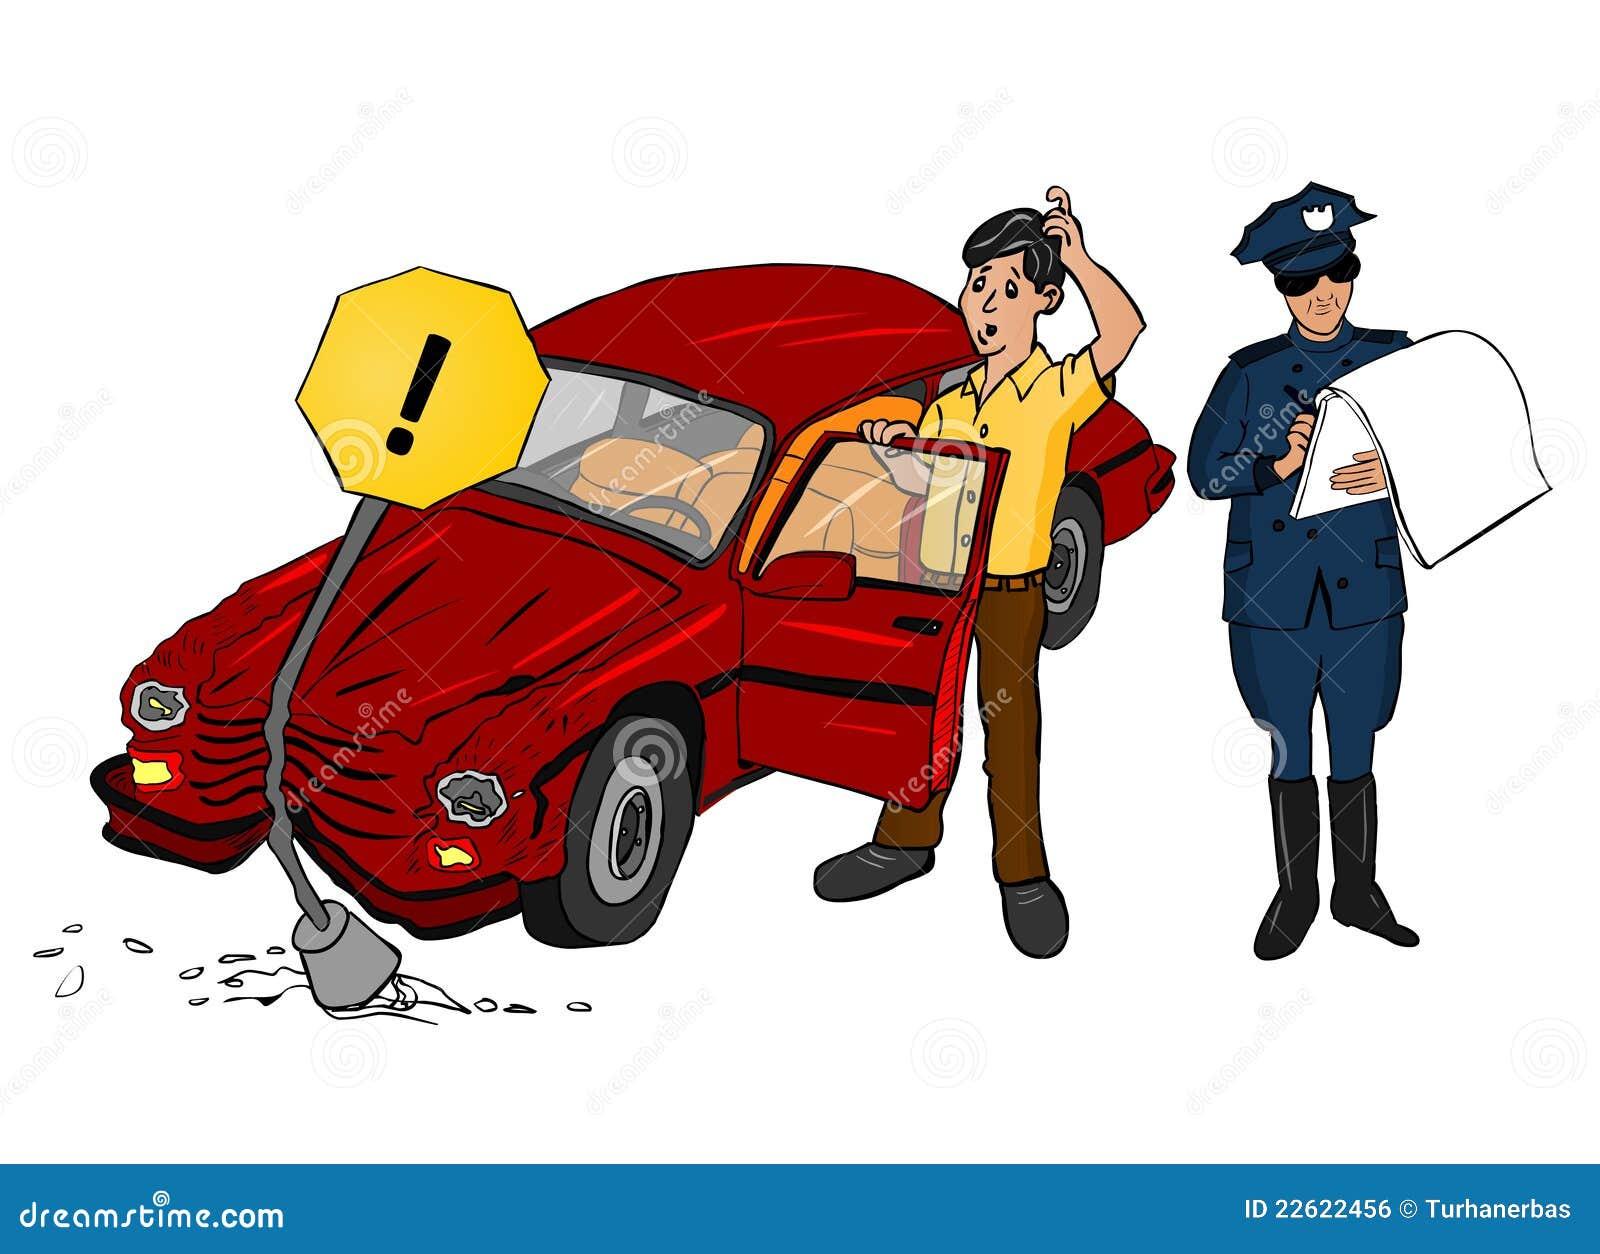 clipart auto accident - photo #49